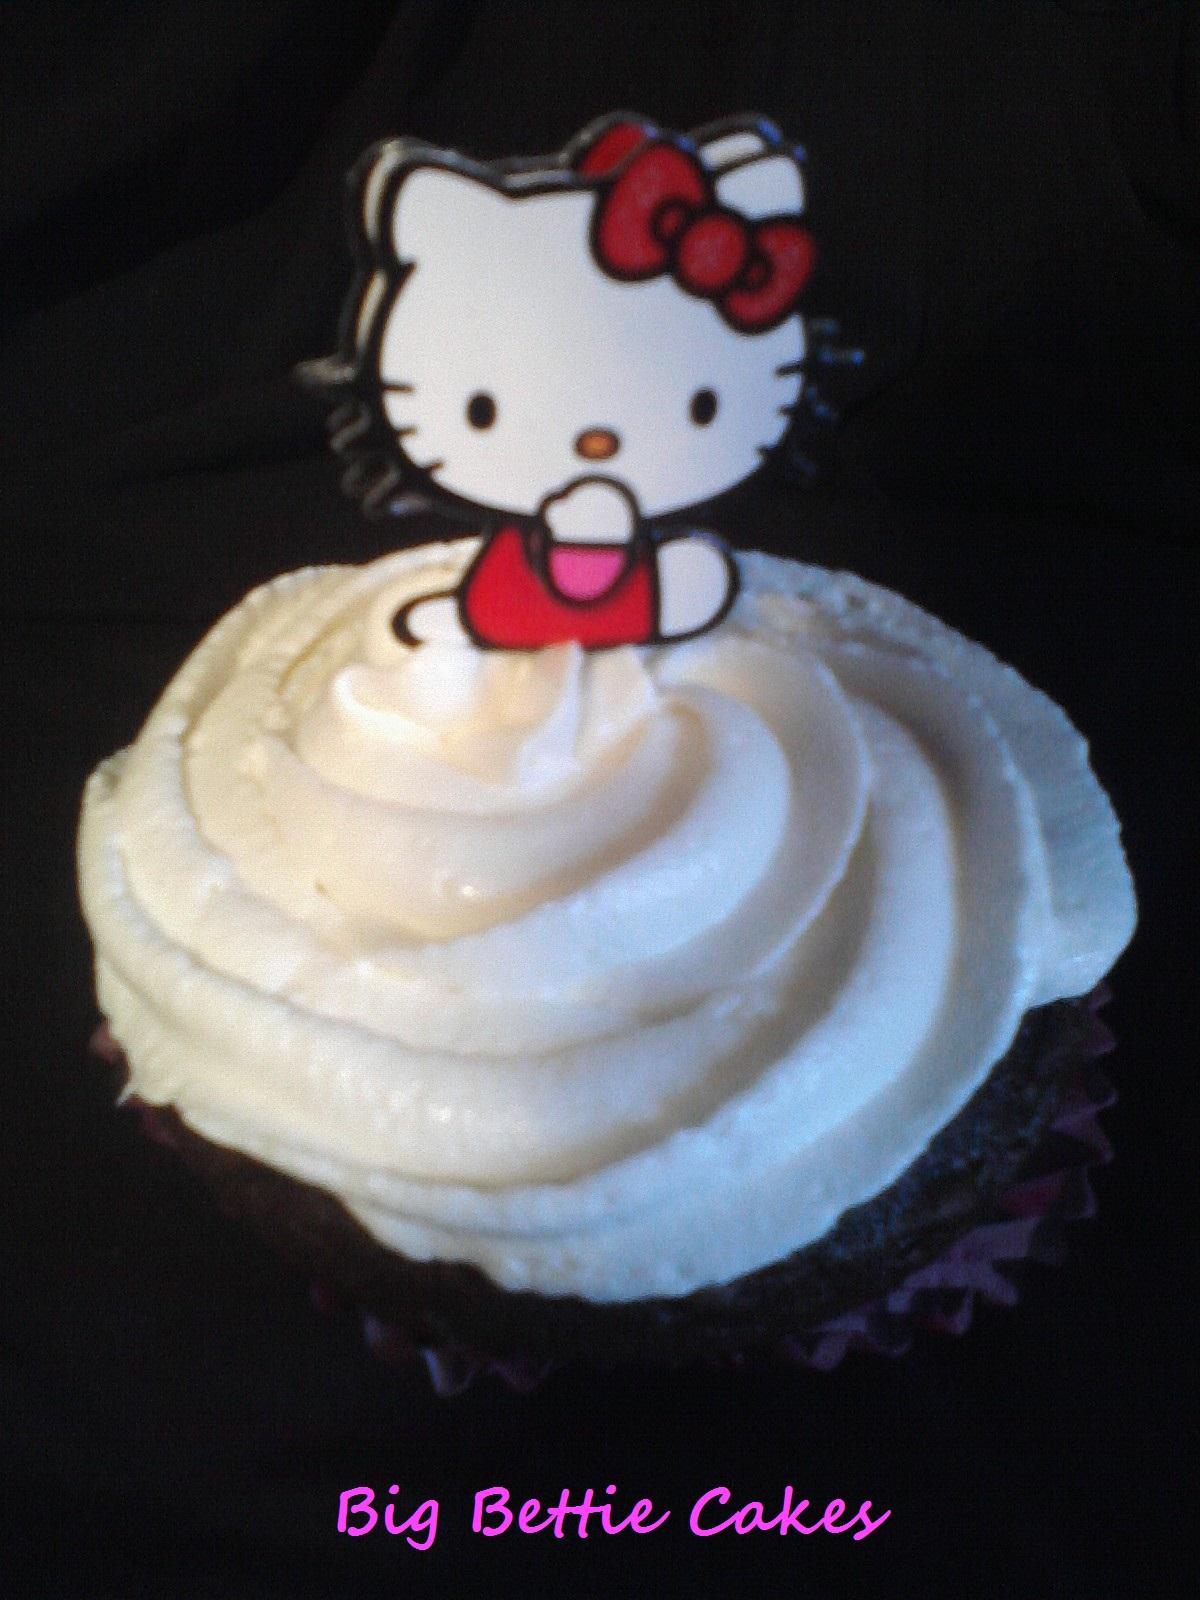 Cake Decorating Classes Near Pomona Ca : Big Bettie cakes: White Hello Kitty Cupcakes